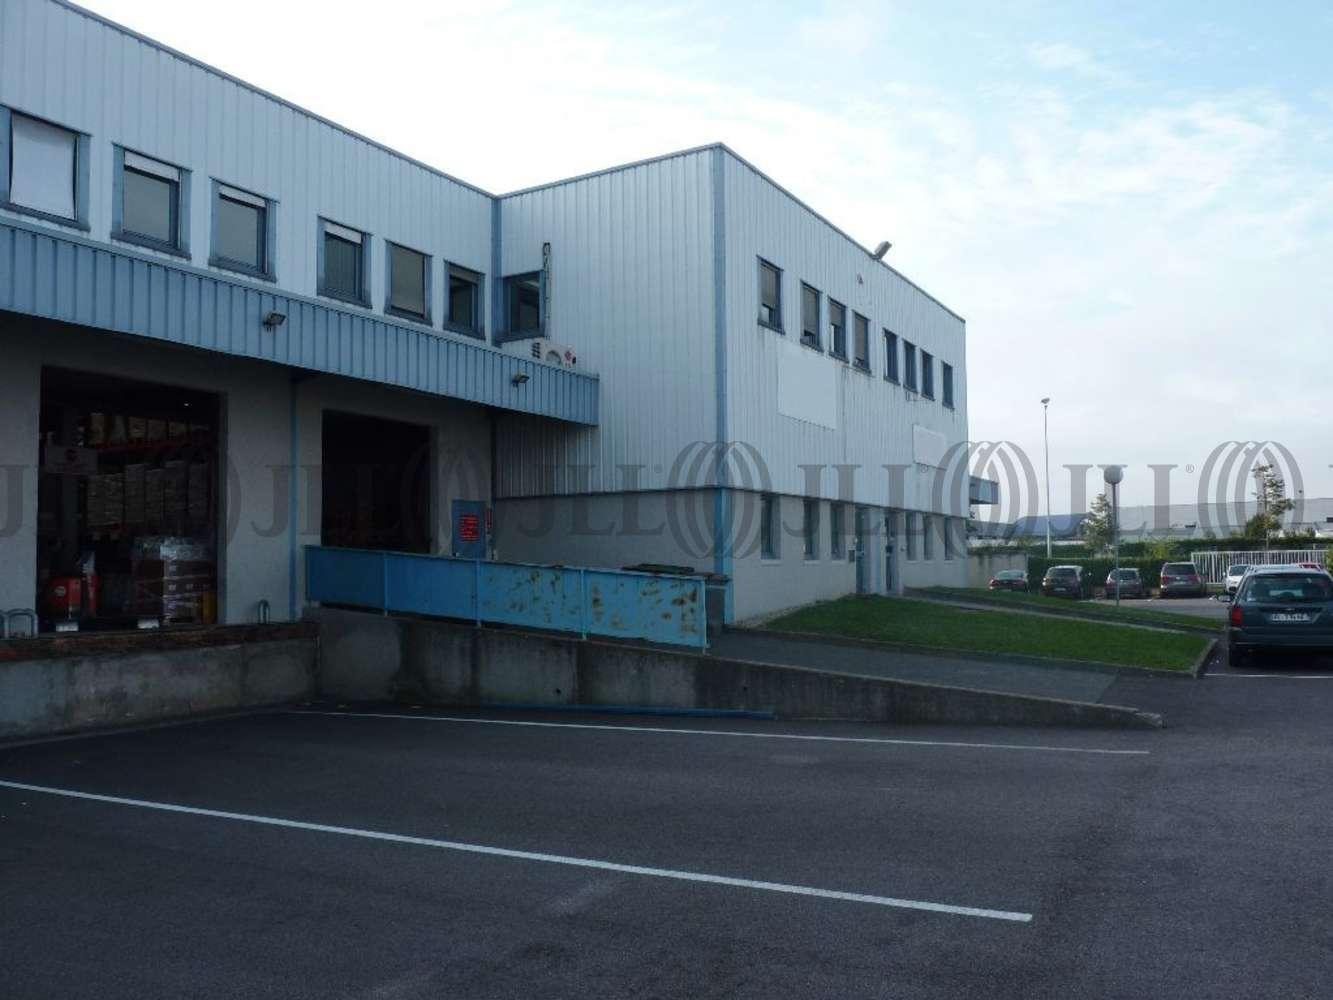 Activités/entrepôt Genas, 69740 - Location entrepot Genas - Lyon Est (69) - 10322575